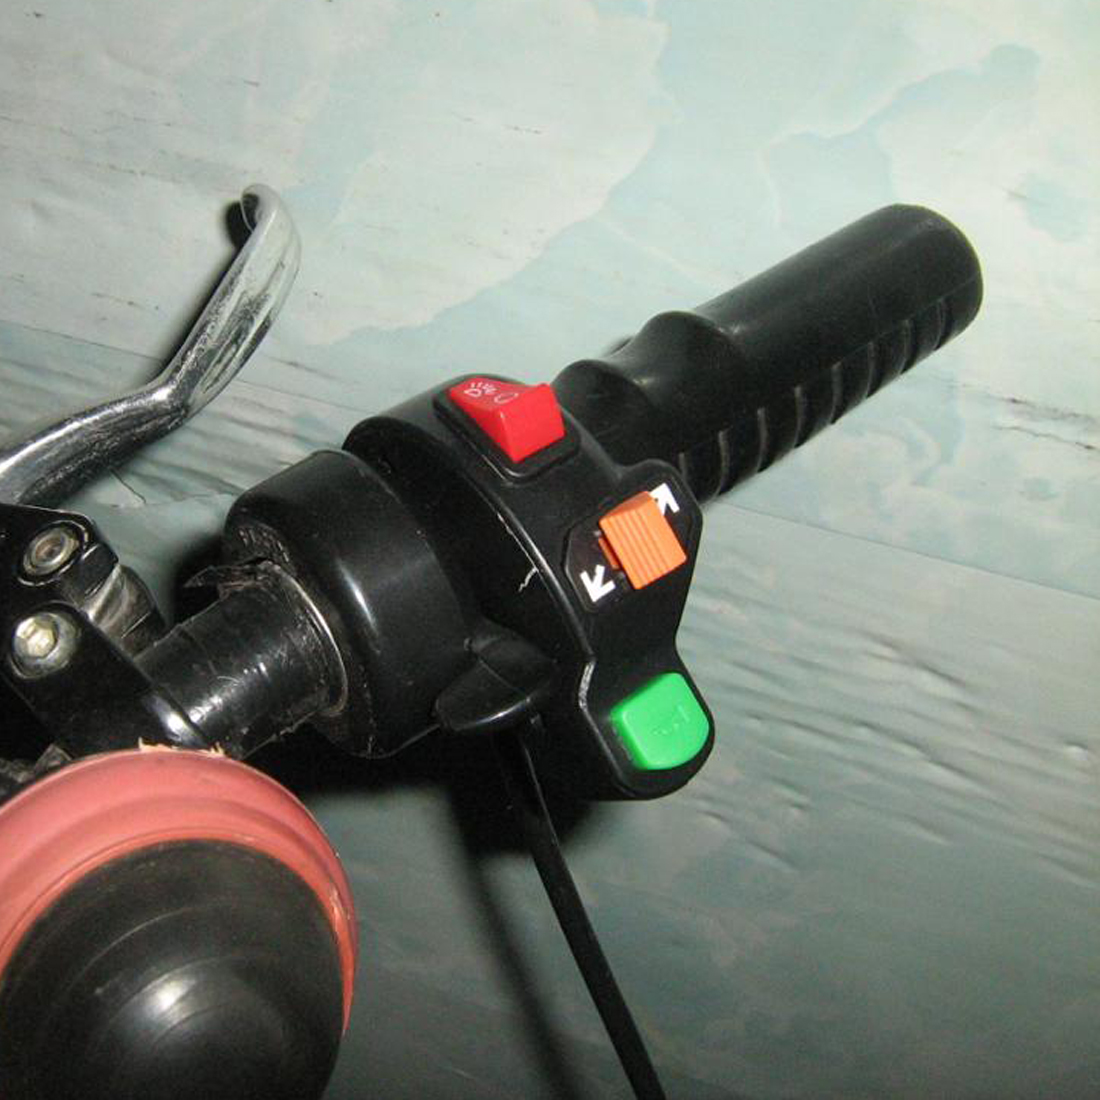 22 Mm Guidon Switch Assembly 7 boutons Array for ATV Moto Vélos de course